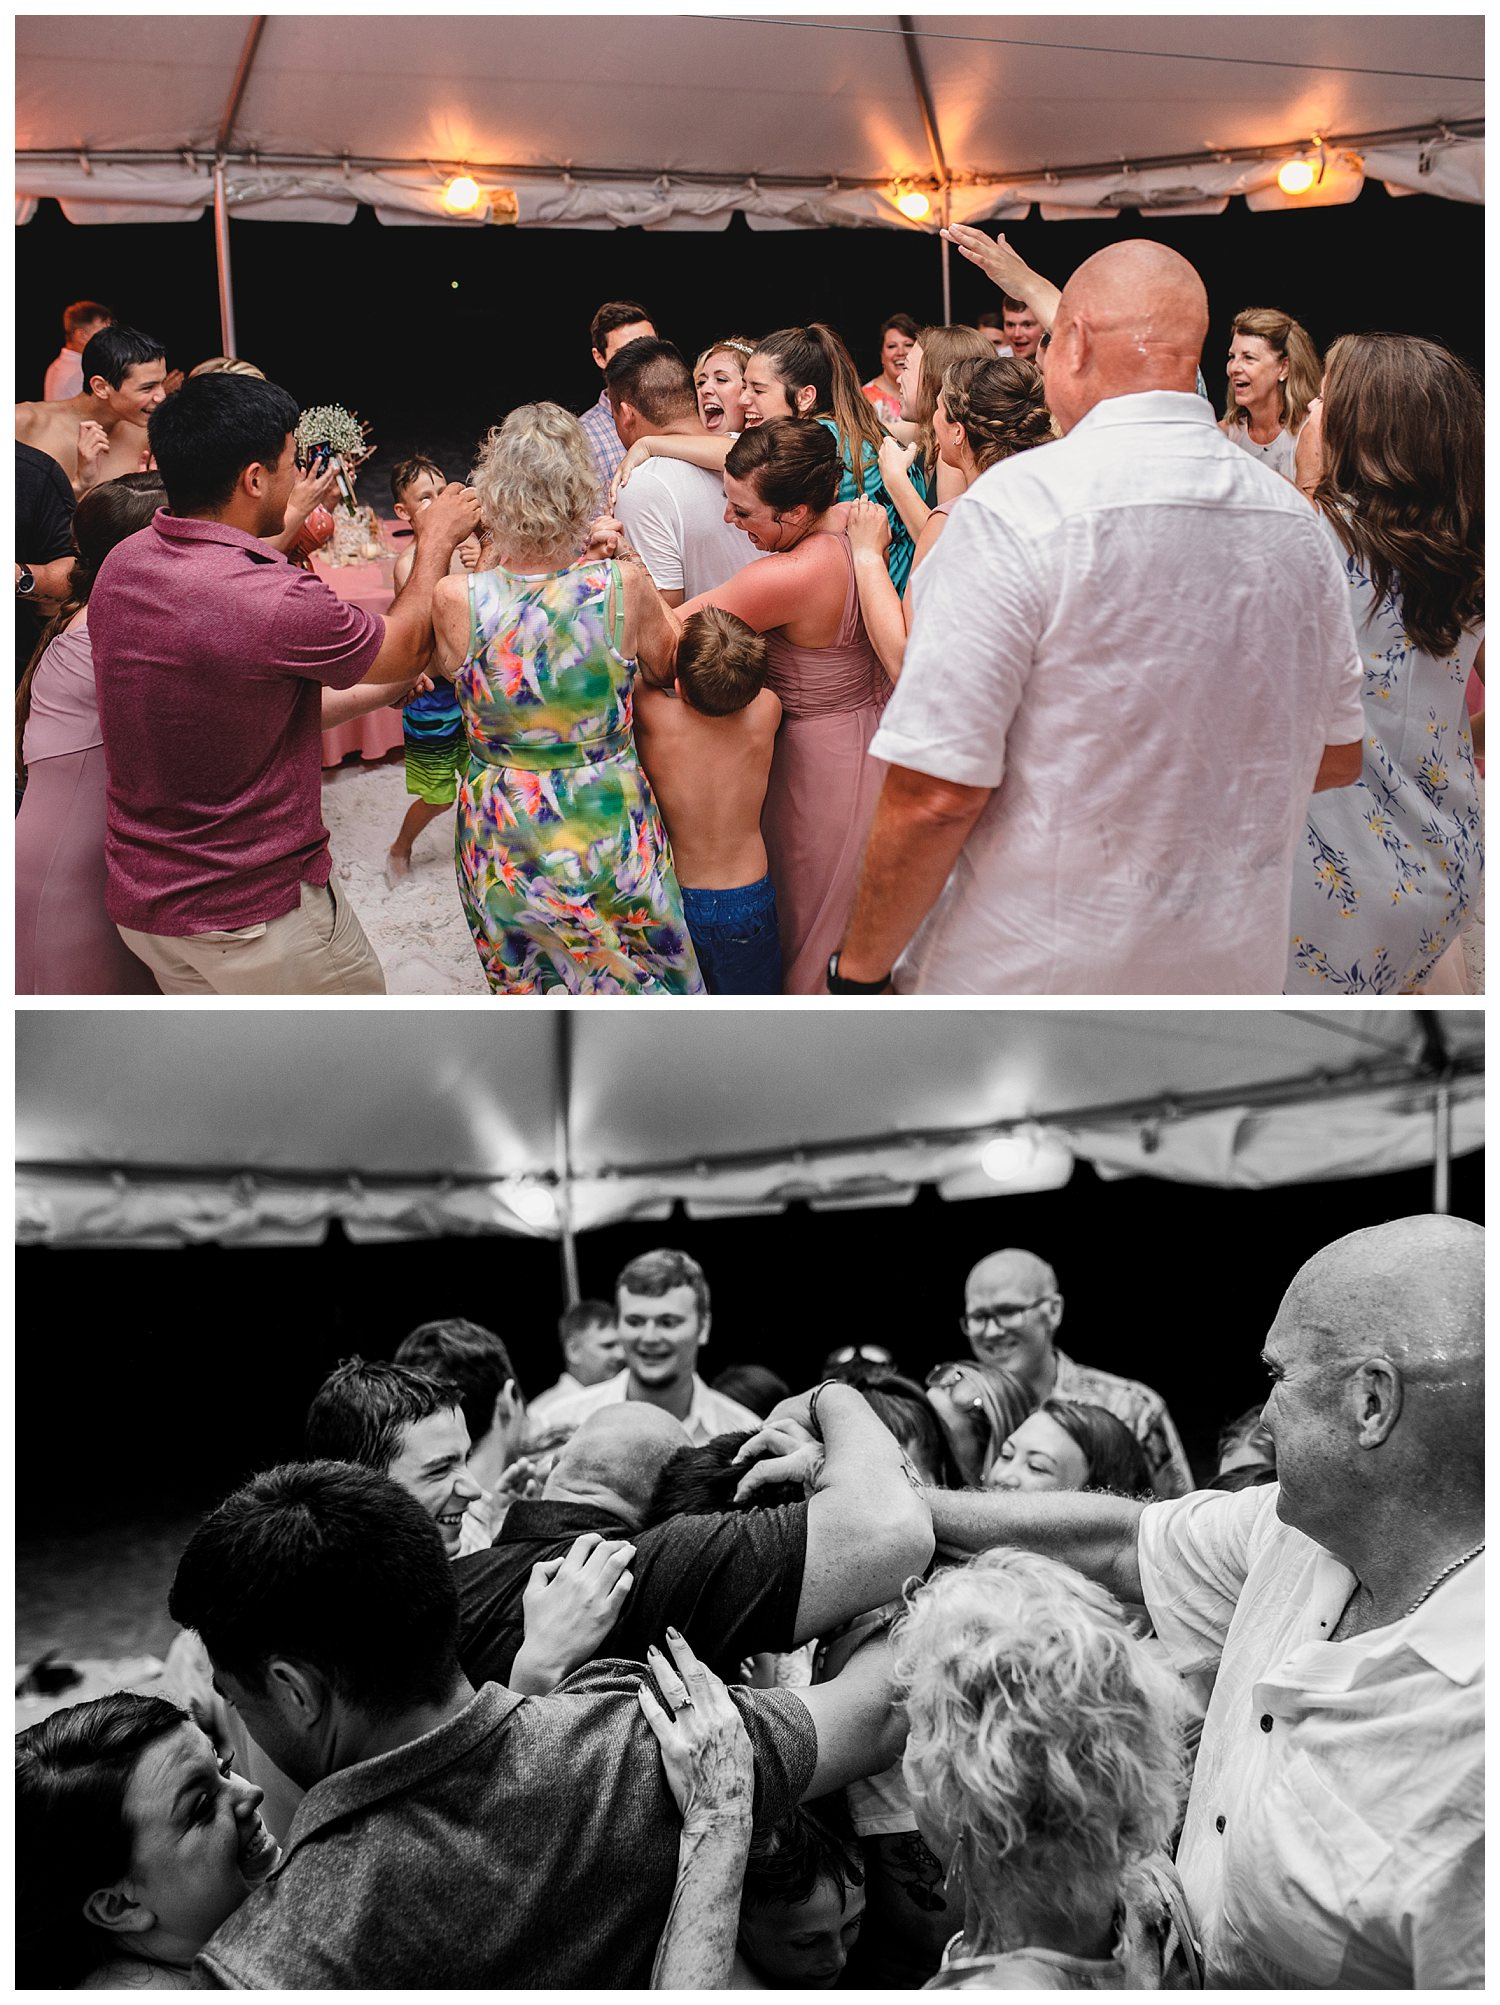 Kelsey_Diane_Photography_Destination_Wedding_Sarasota_Florida_Beach_Wedding_Alex_Austin_0693.jpg